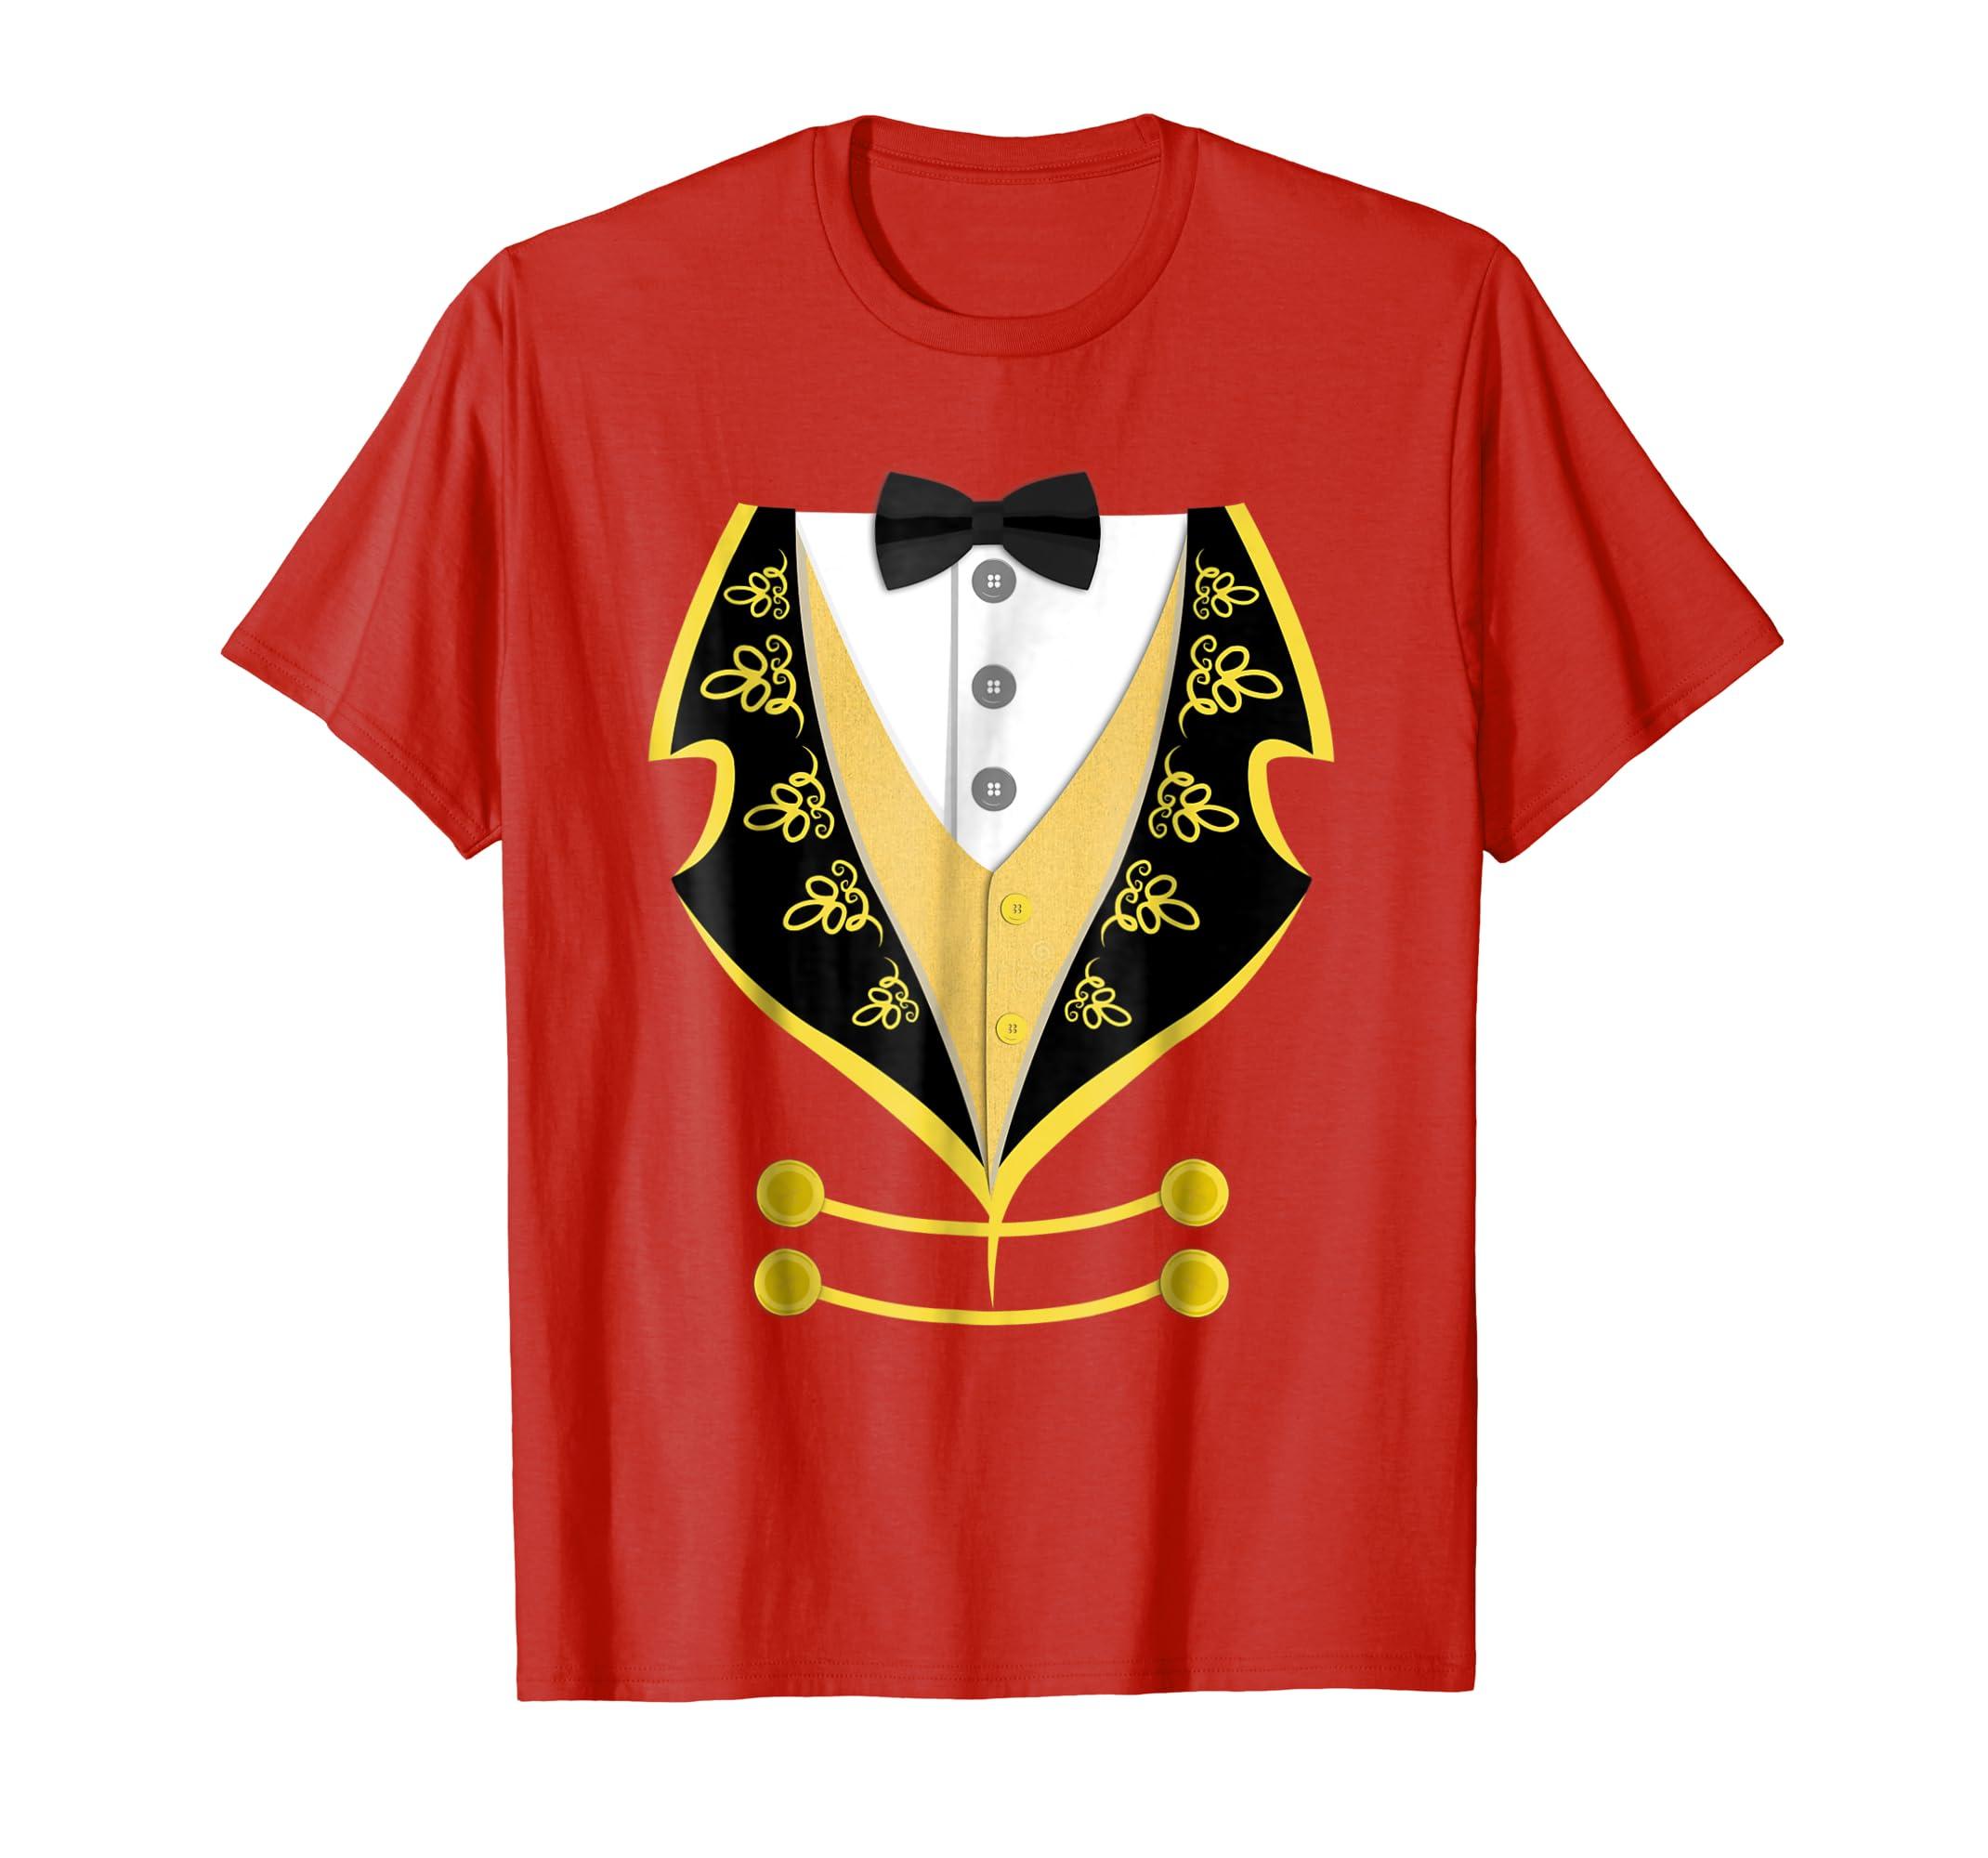 Ringmaster Shirt Circus Costume T Shirt-mt